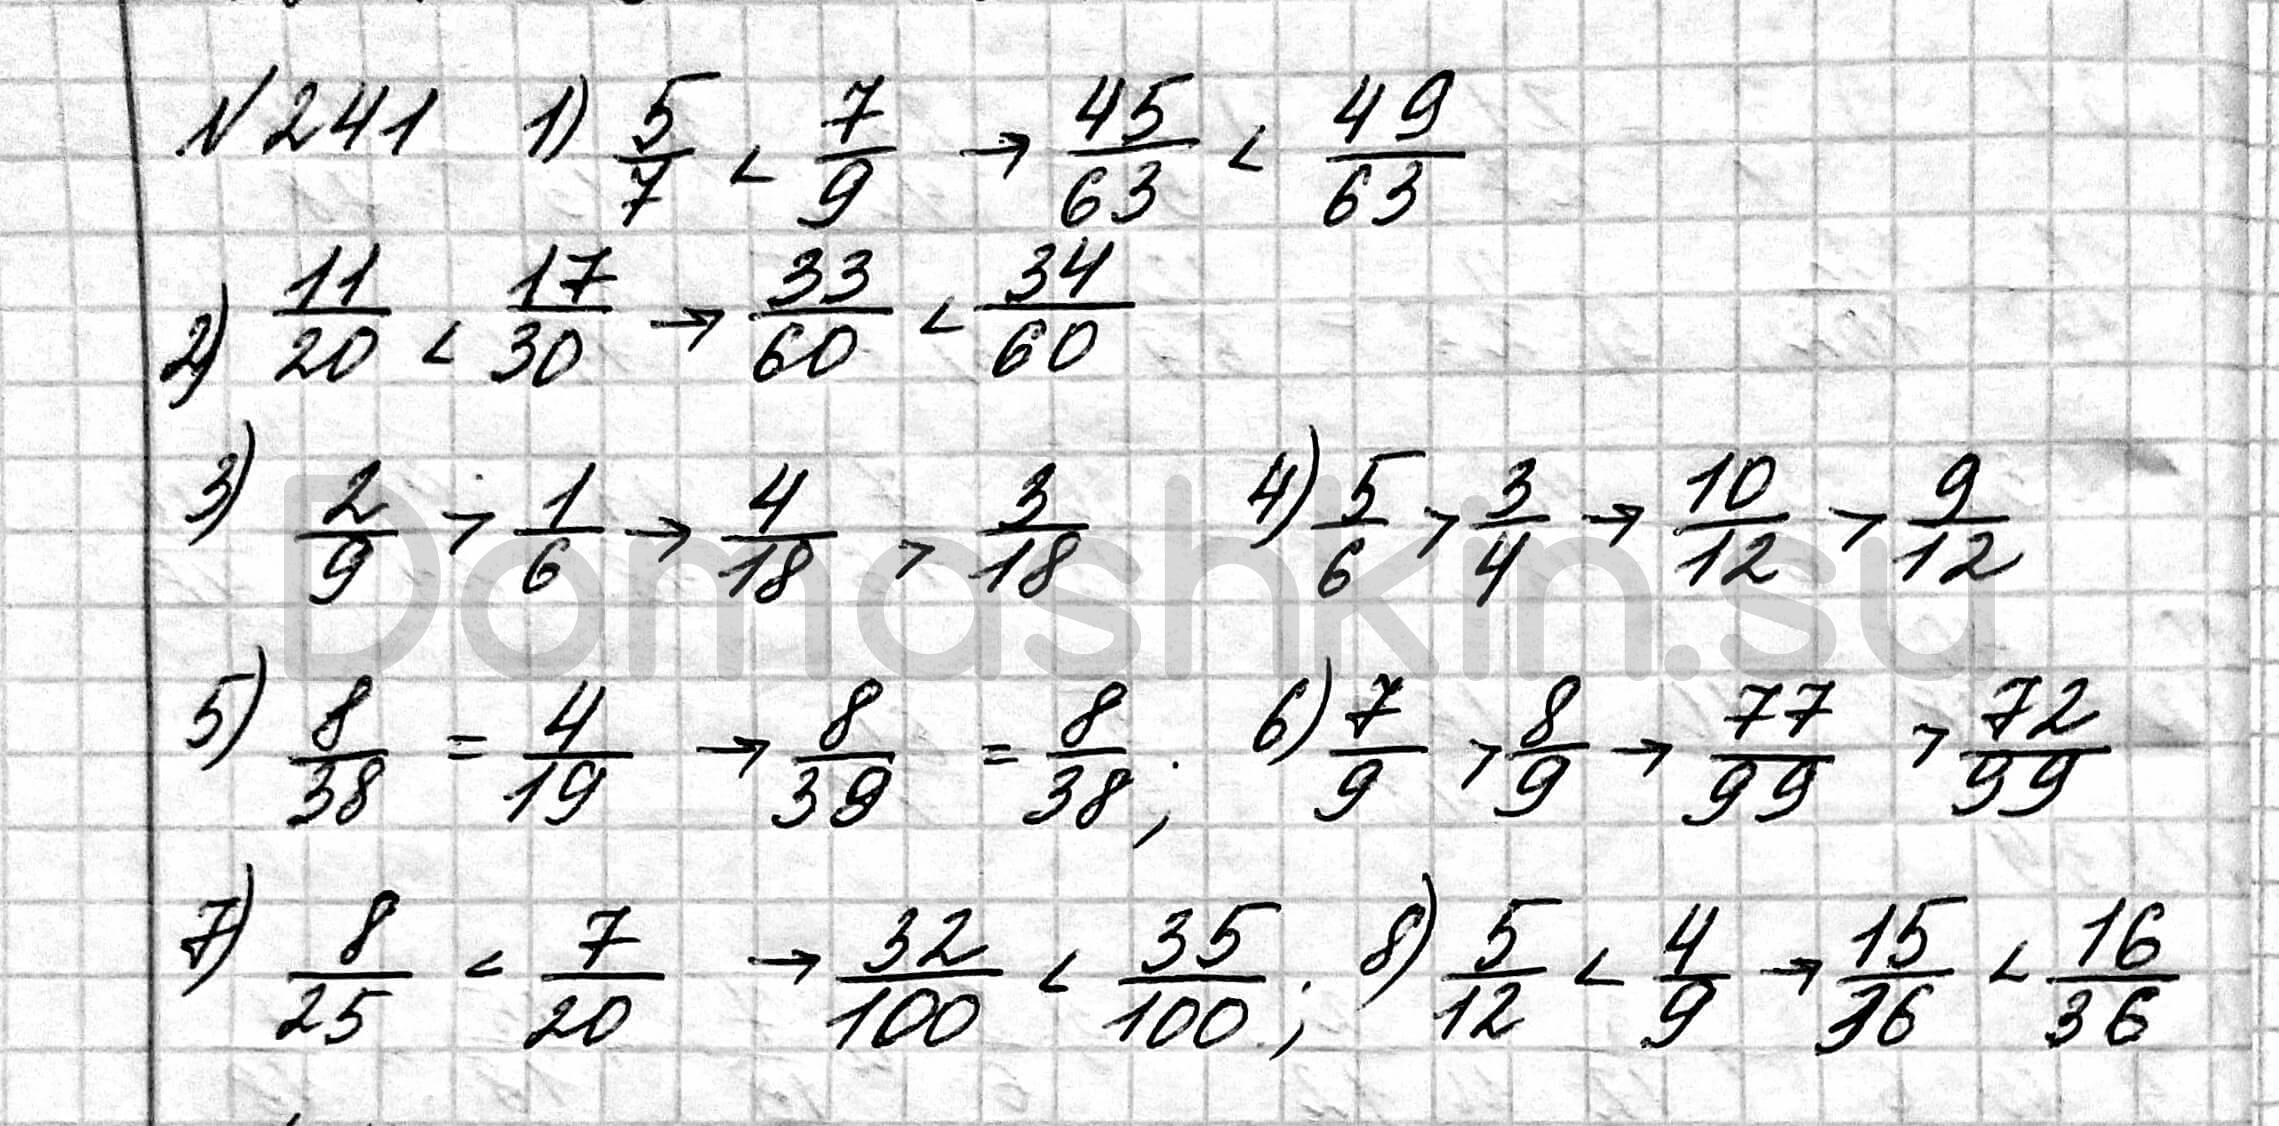 Математика 6 класс учебник Мерзляк номер 241 решение